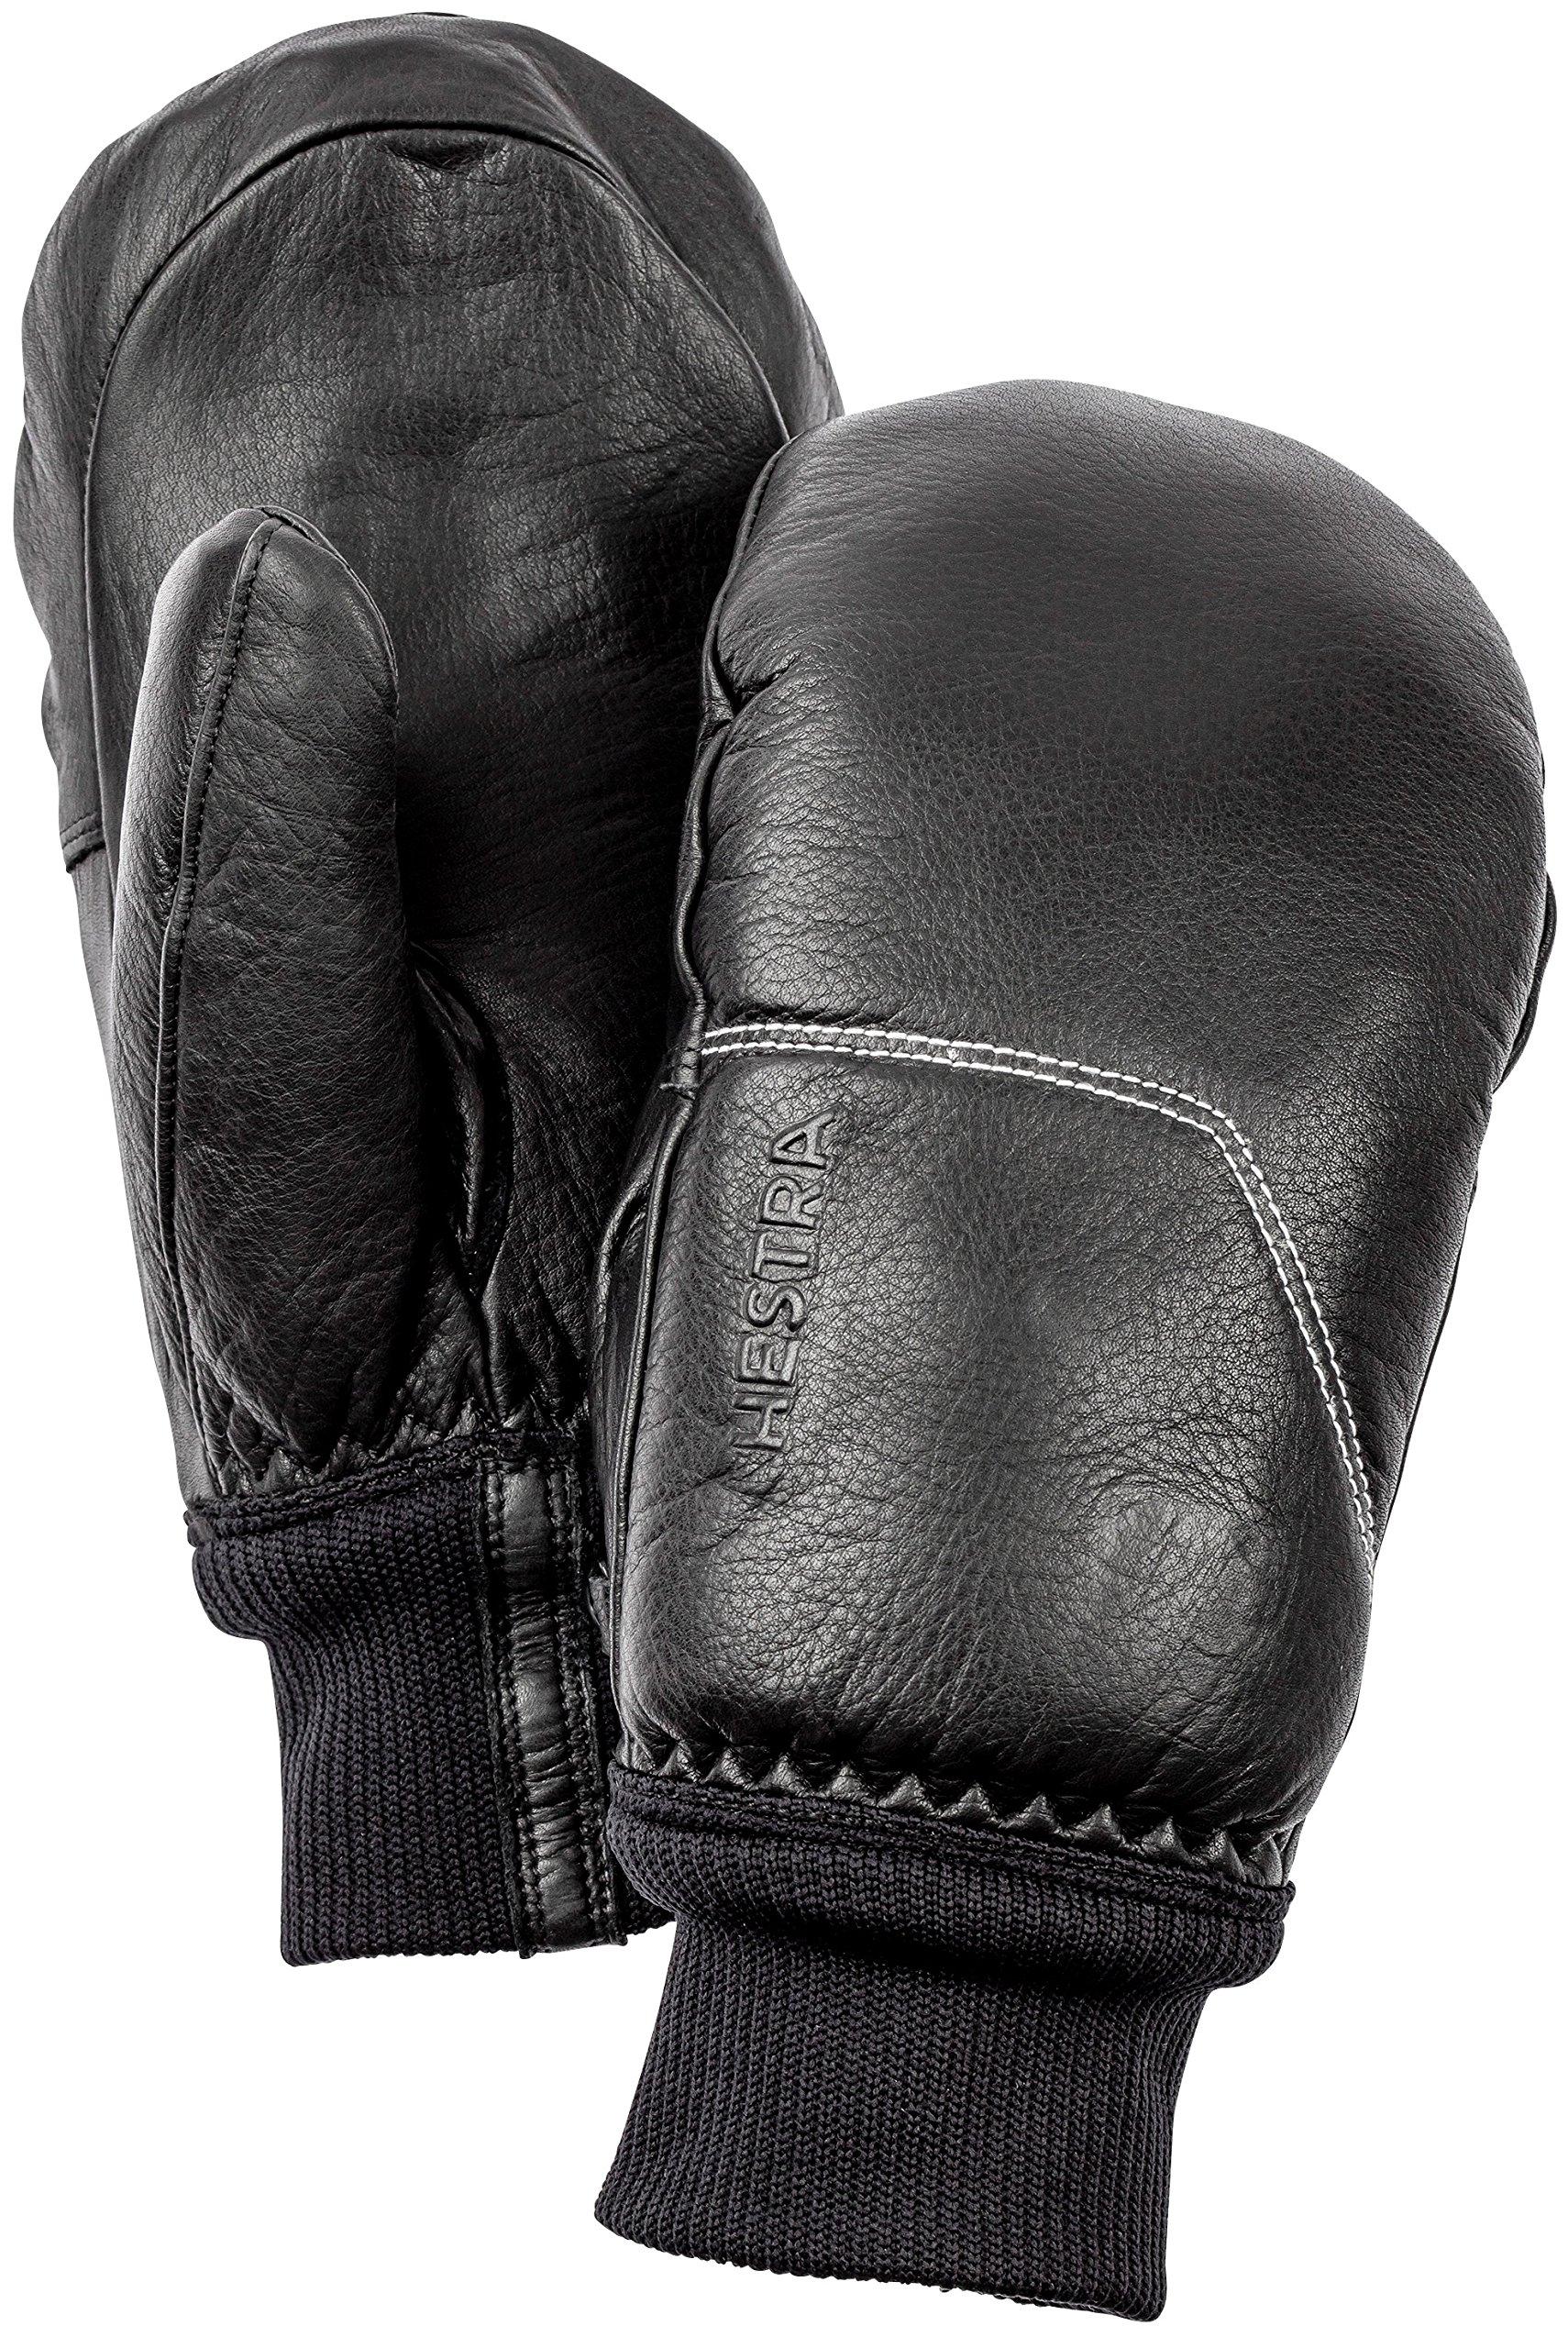 Hestra Ski Gloves: Omni Cold Weater Winter Leather Mittens, Black/Black, 7